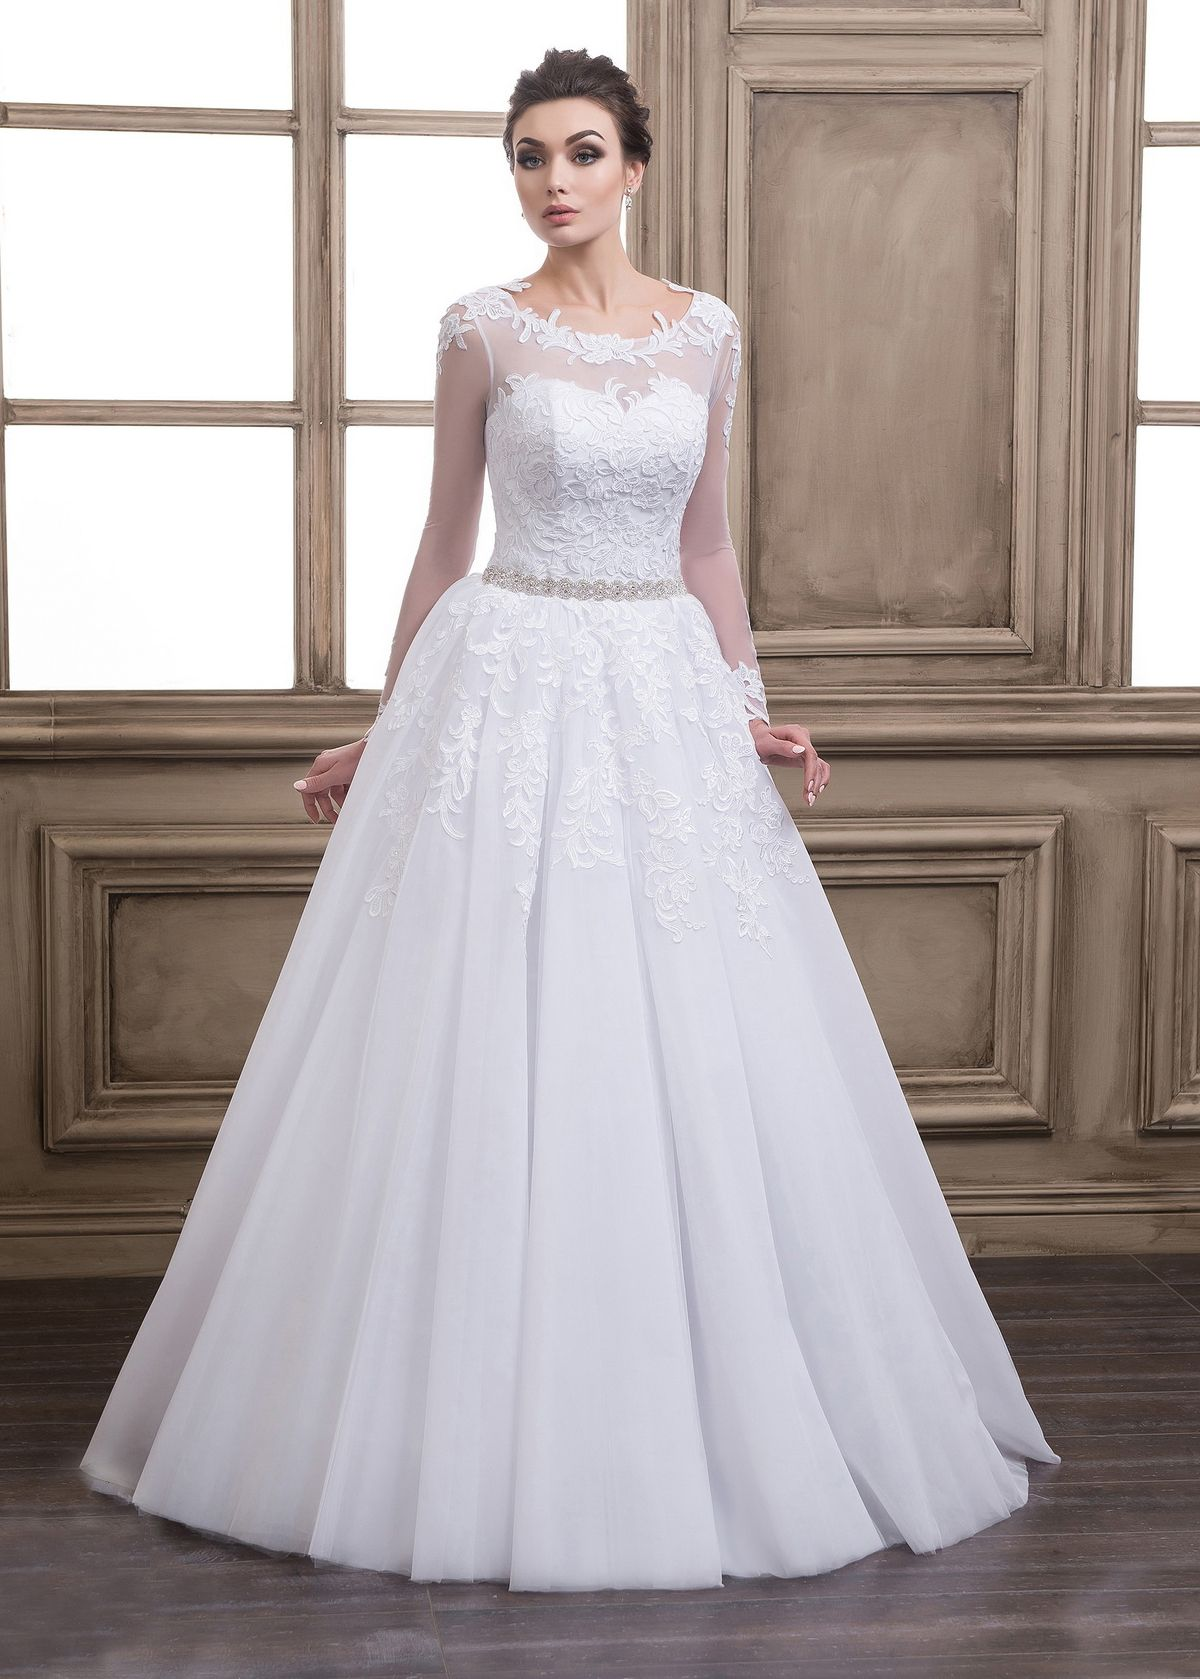 Long sleeves white lace tulle beaded sash wedding dress cotillion